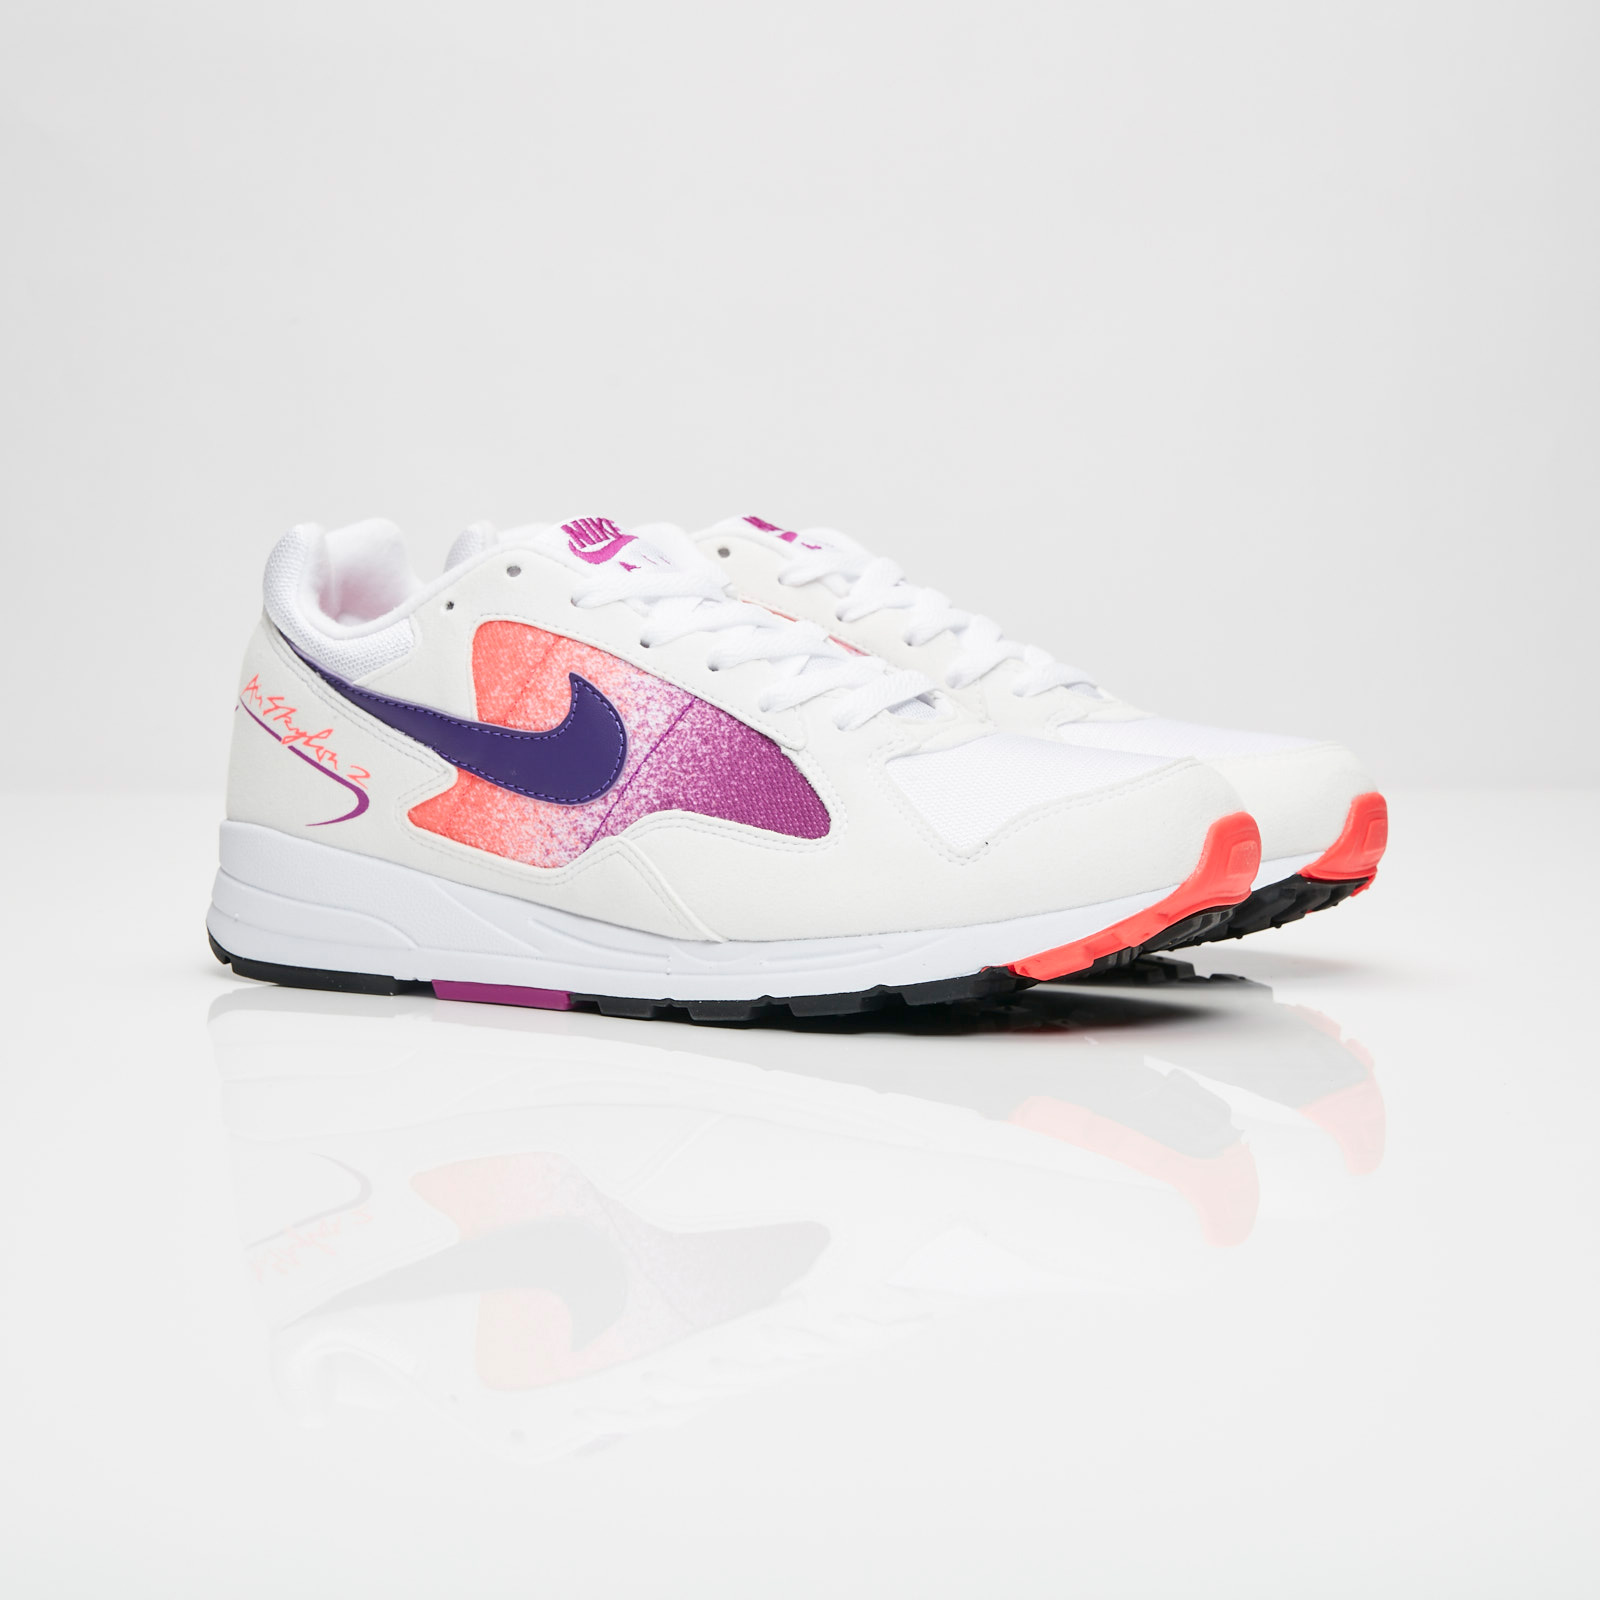 33a587833a7664 Nike Air Skylon II - Ao1551-103 - Sneakersnstuff